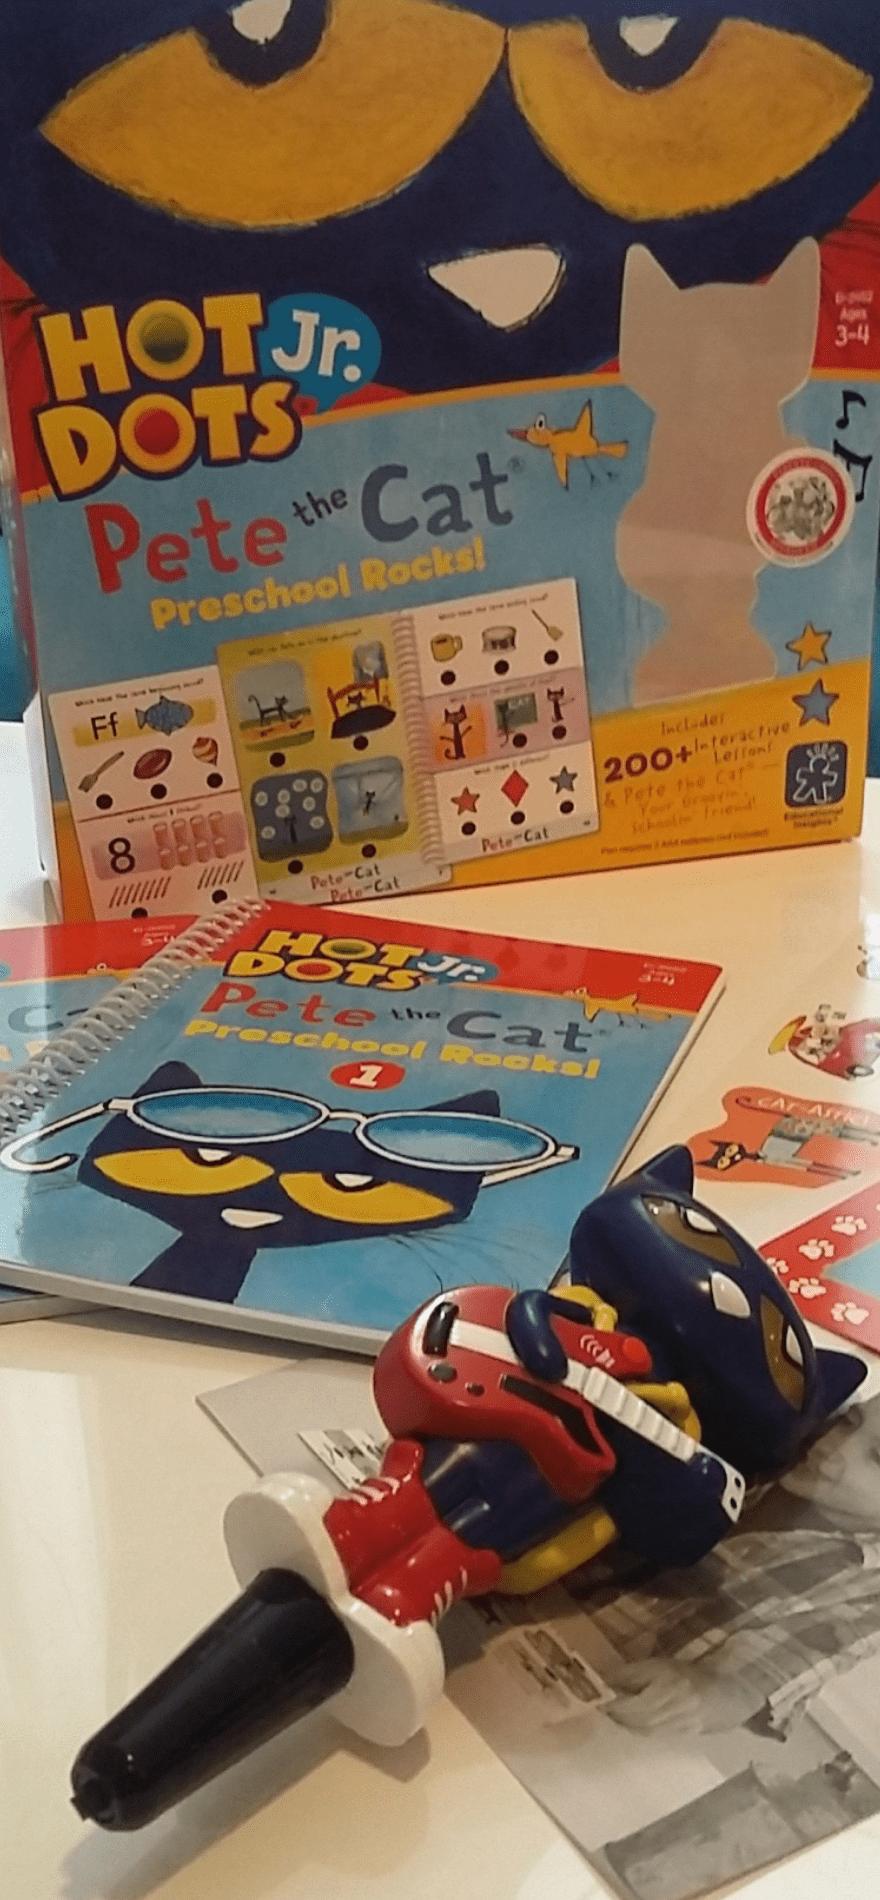 Getting Ready for Preschool With Hot Dots® Jr. Pete the Cat® Preschool Rocks! Set with Pete the Cat®—Your Groovin\', Schoolin\', Friend Pen Hot Dots® Jr. Pete the Cat® Preschool Rocks.